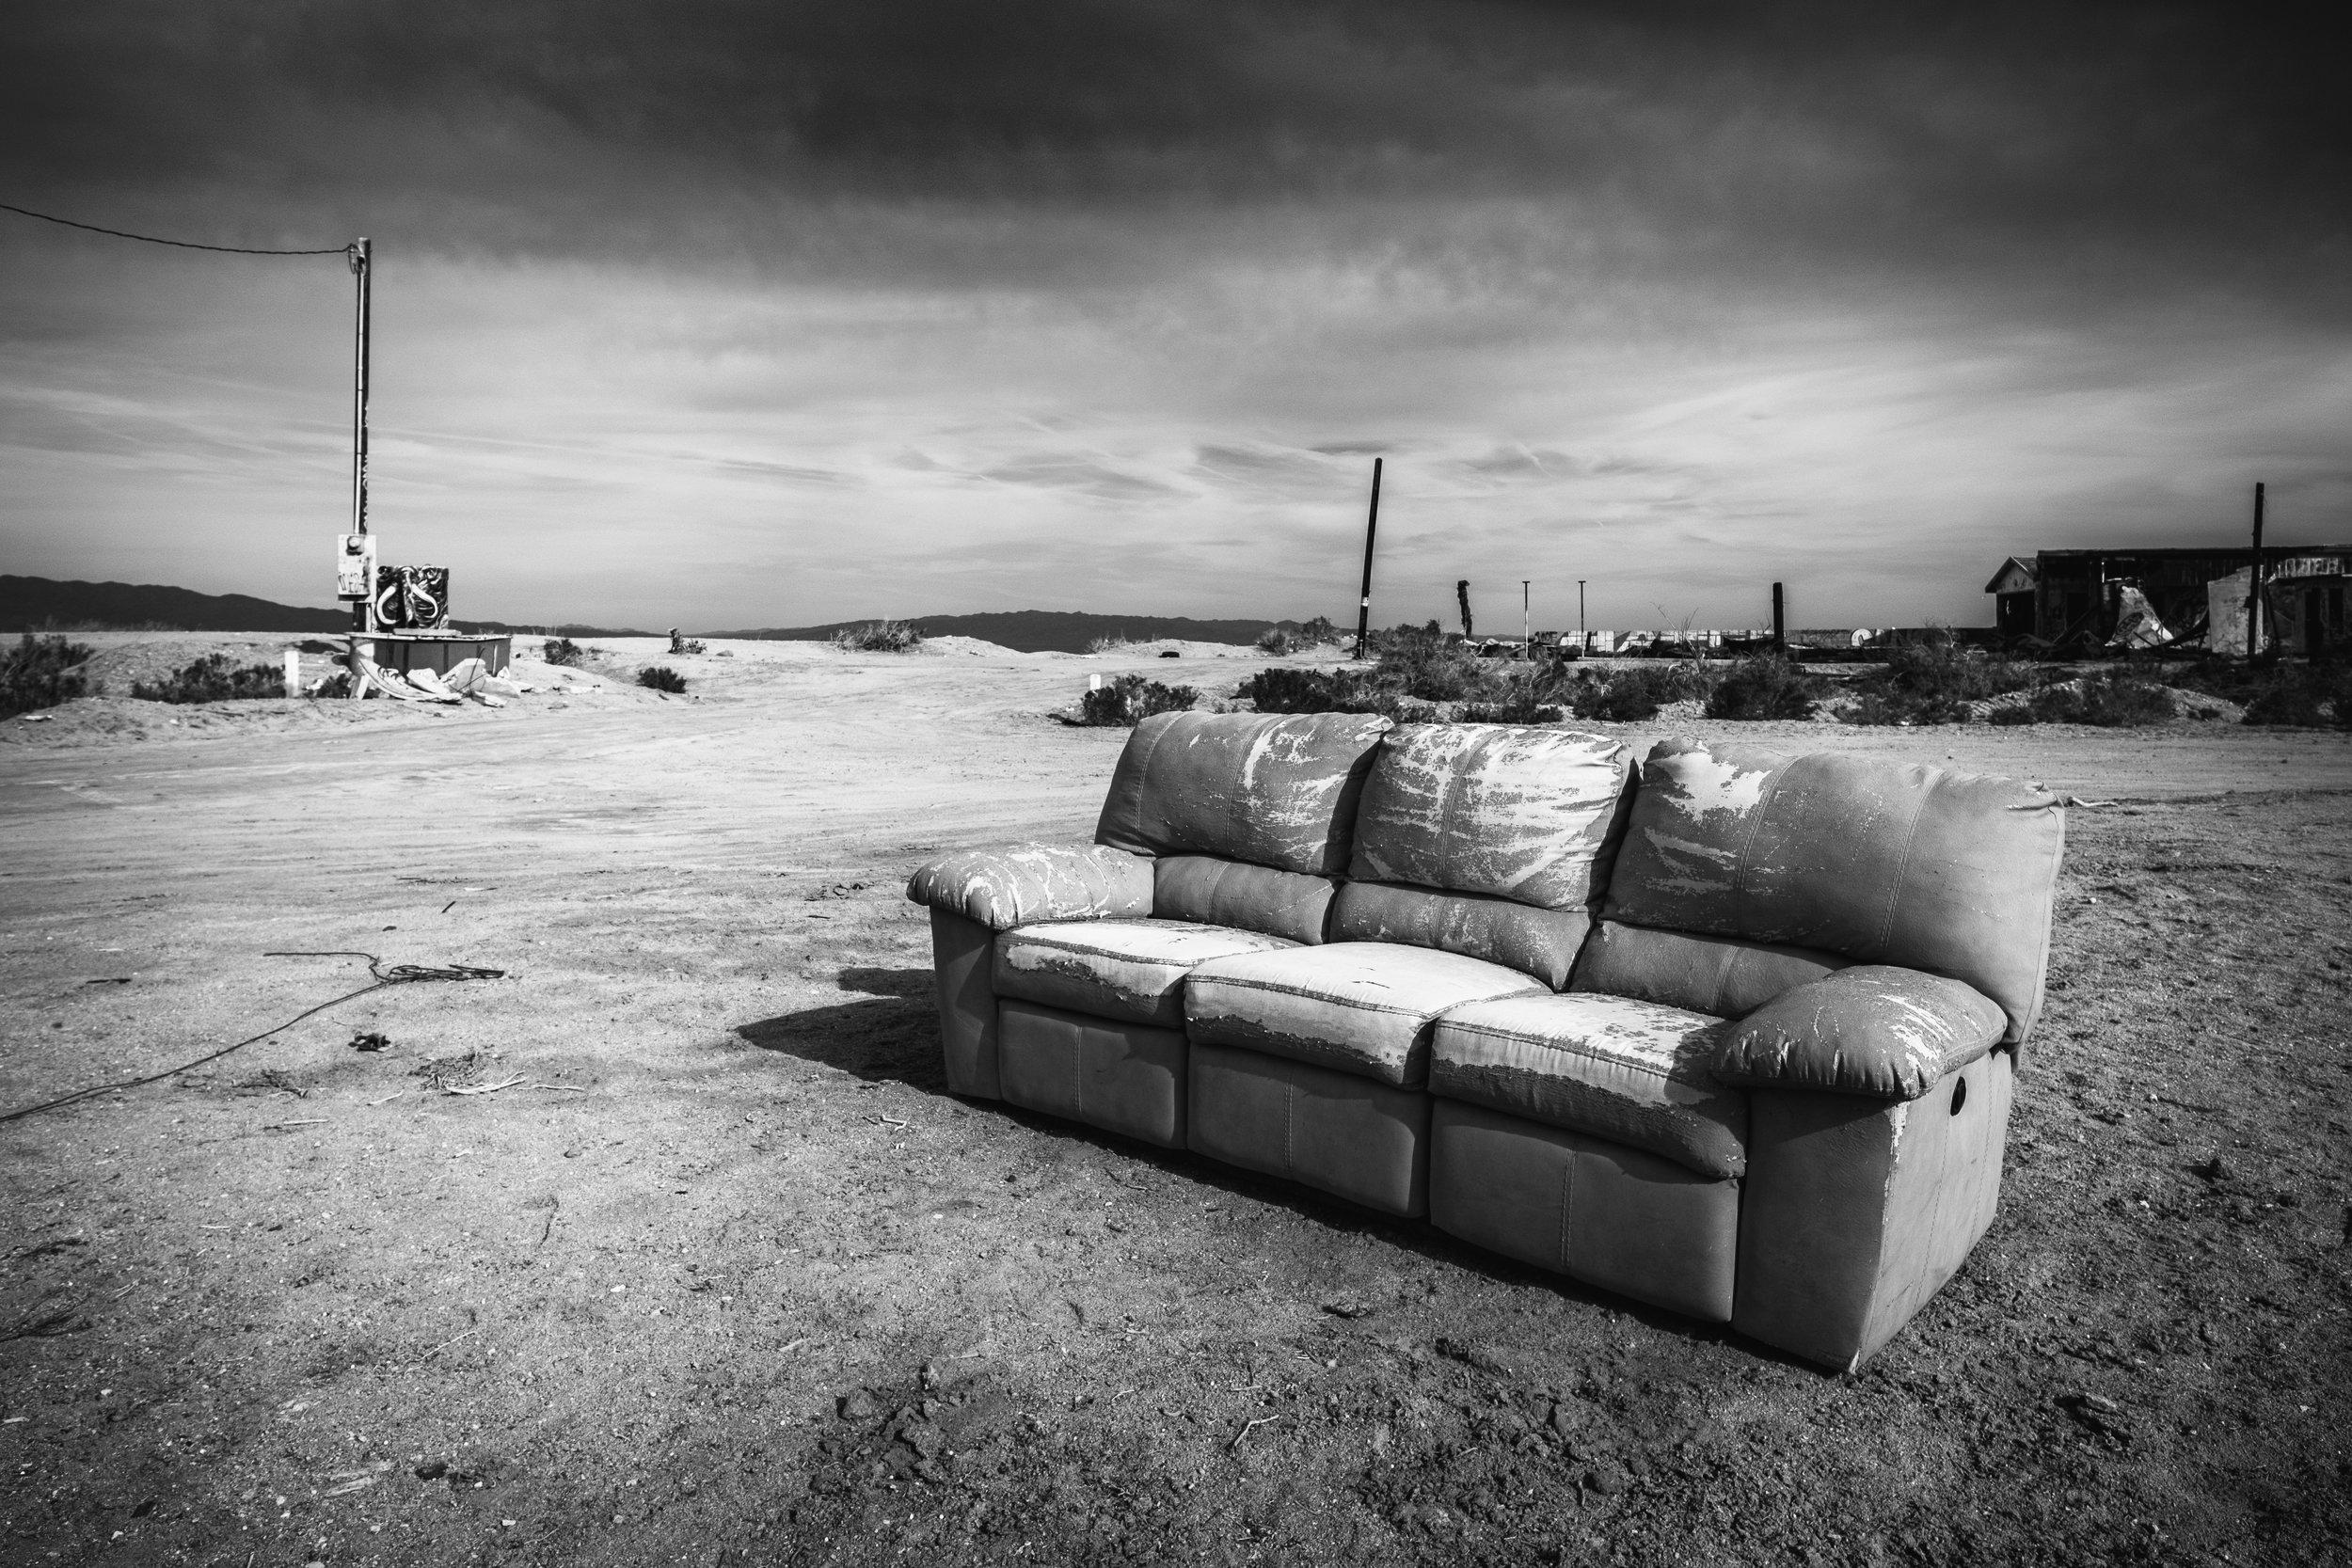 Salton Sea Beach. 1/750 @ f8, ISO 200.